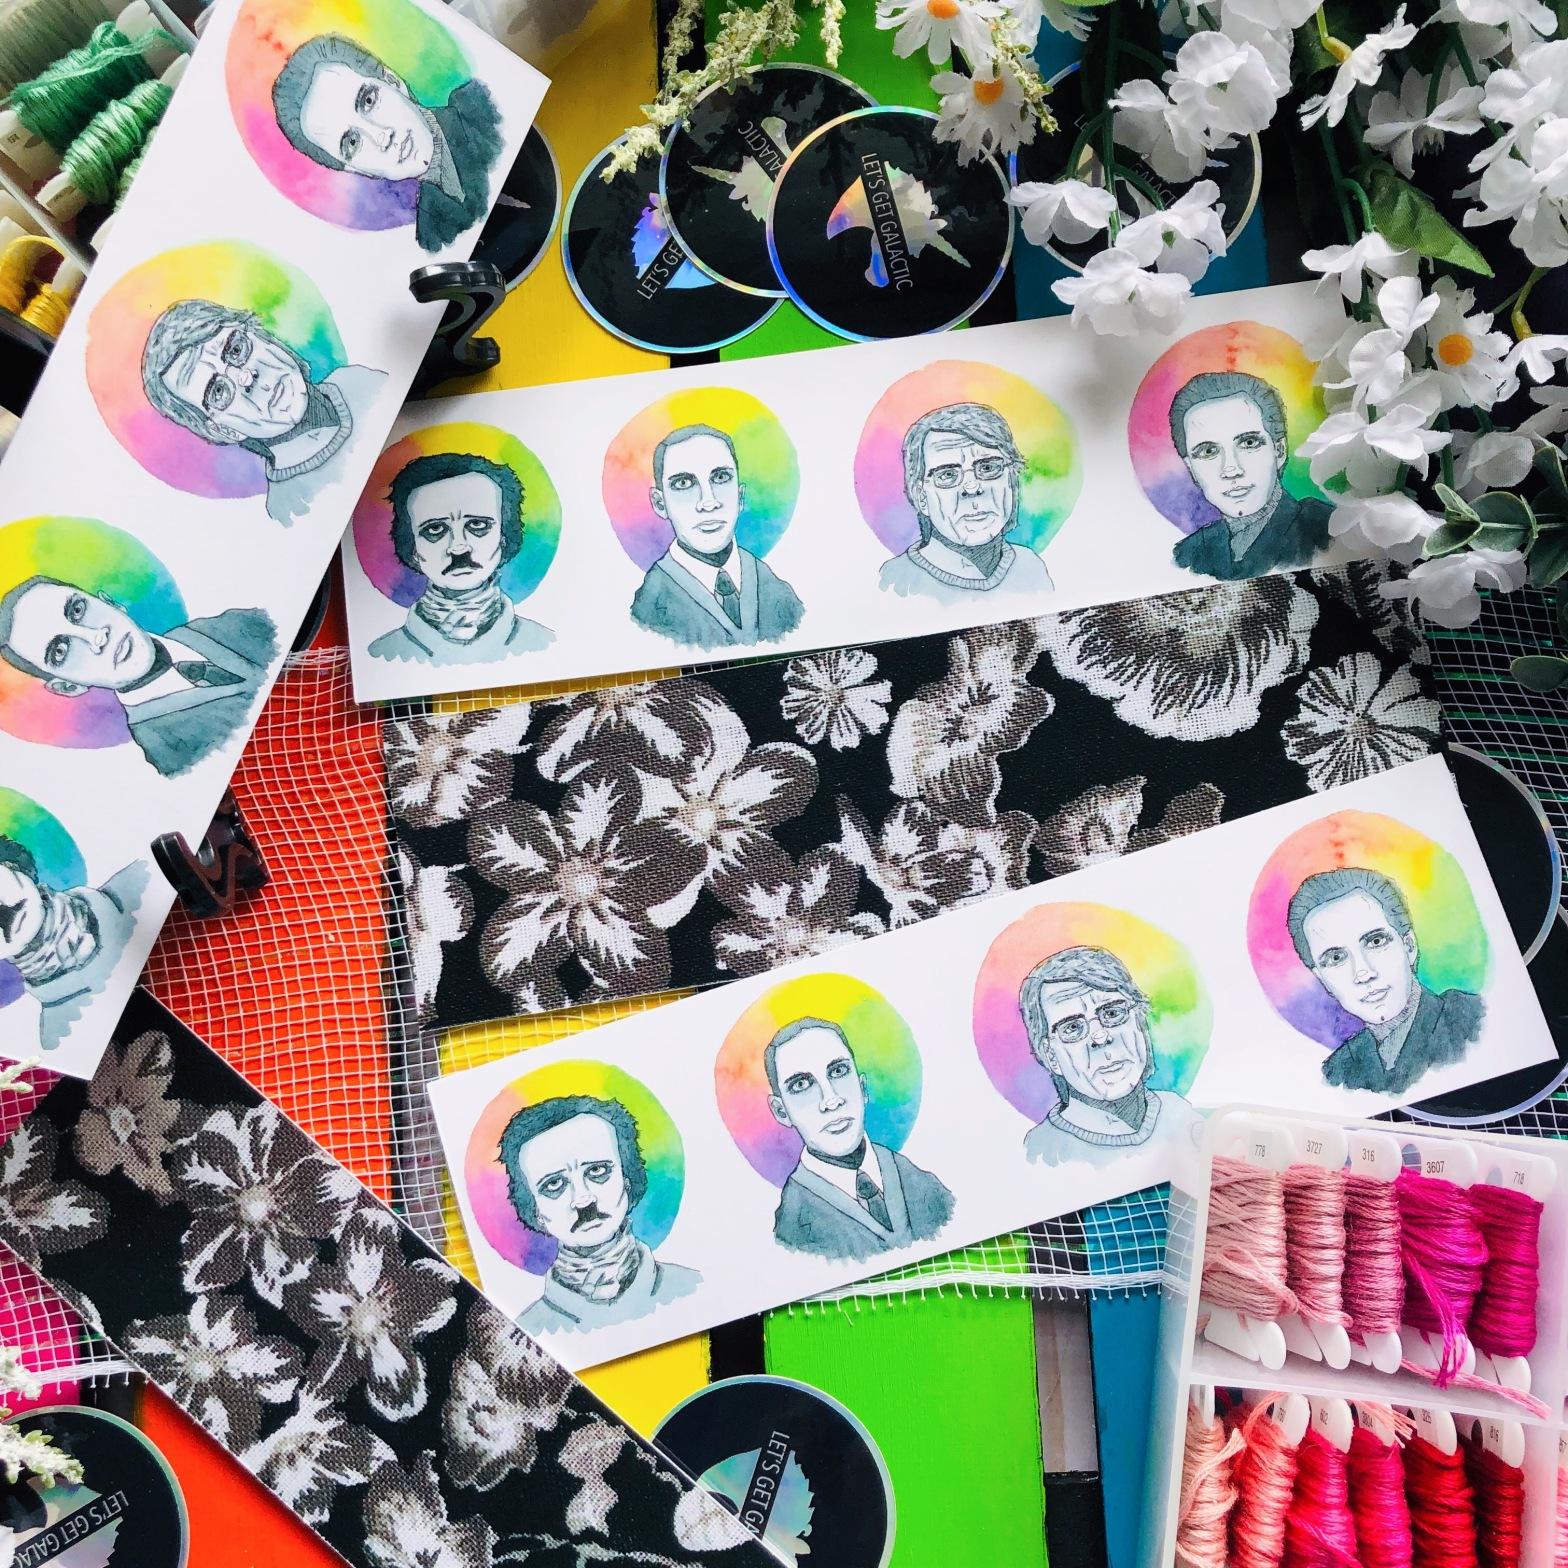 Stephen King, Edgar Allan Poe, Lovecraft, Clive Barker portraits on bookmarks